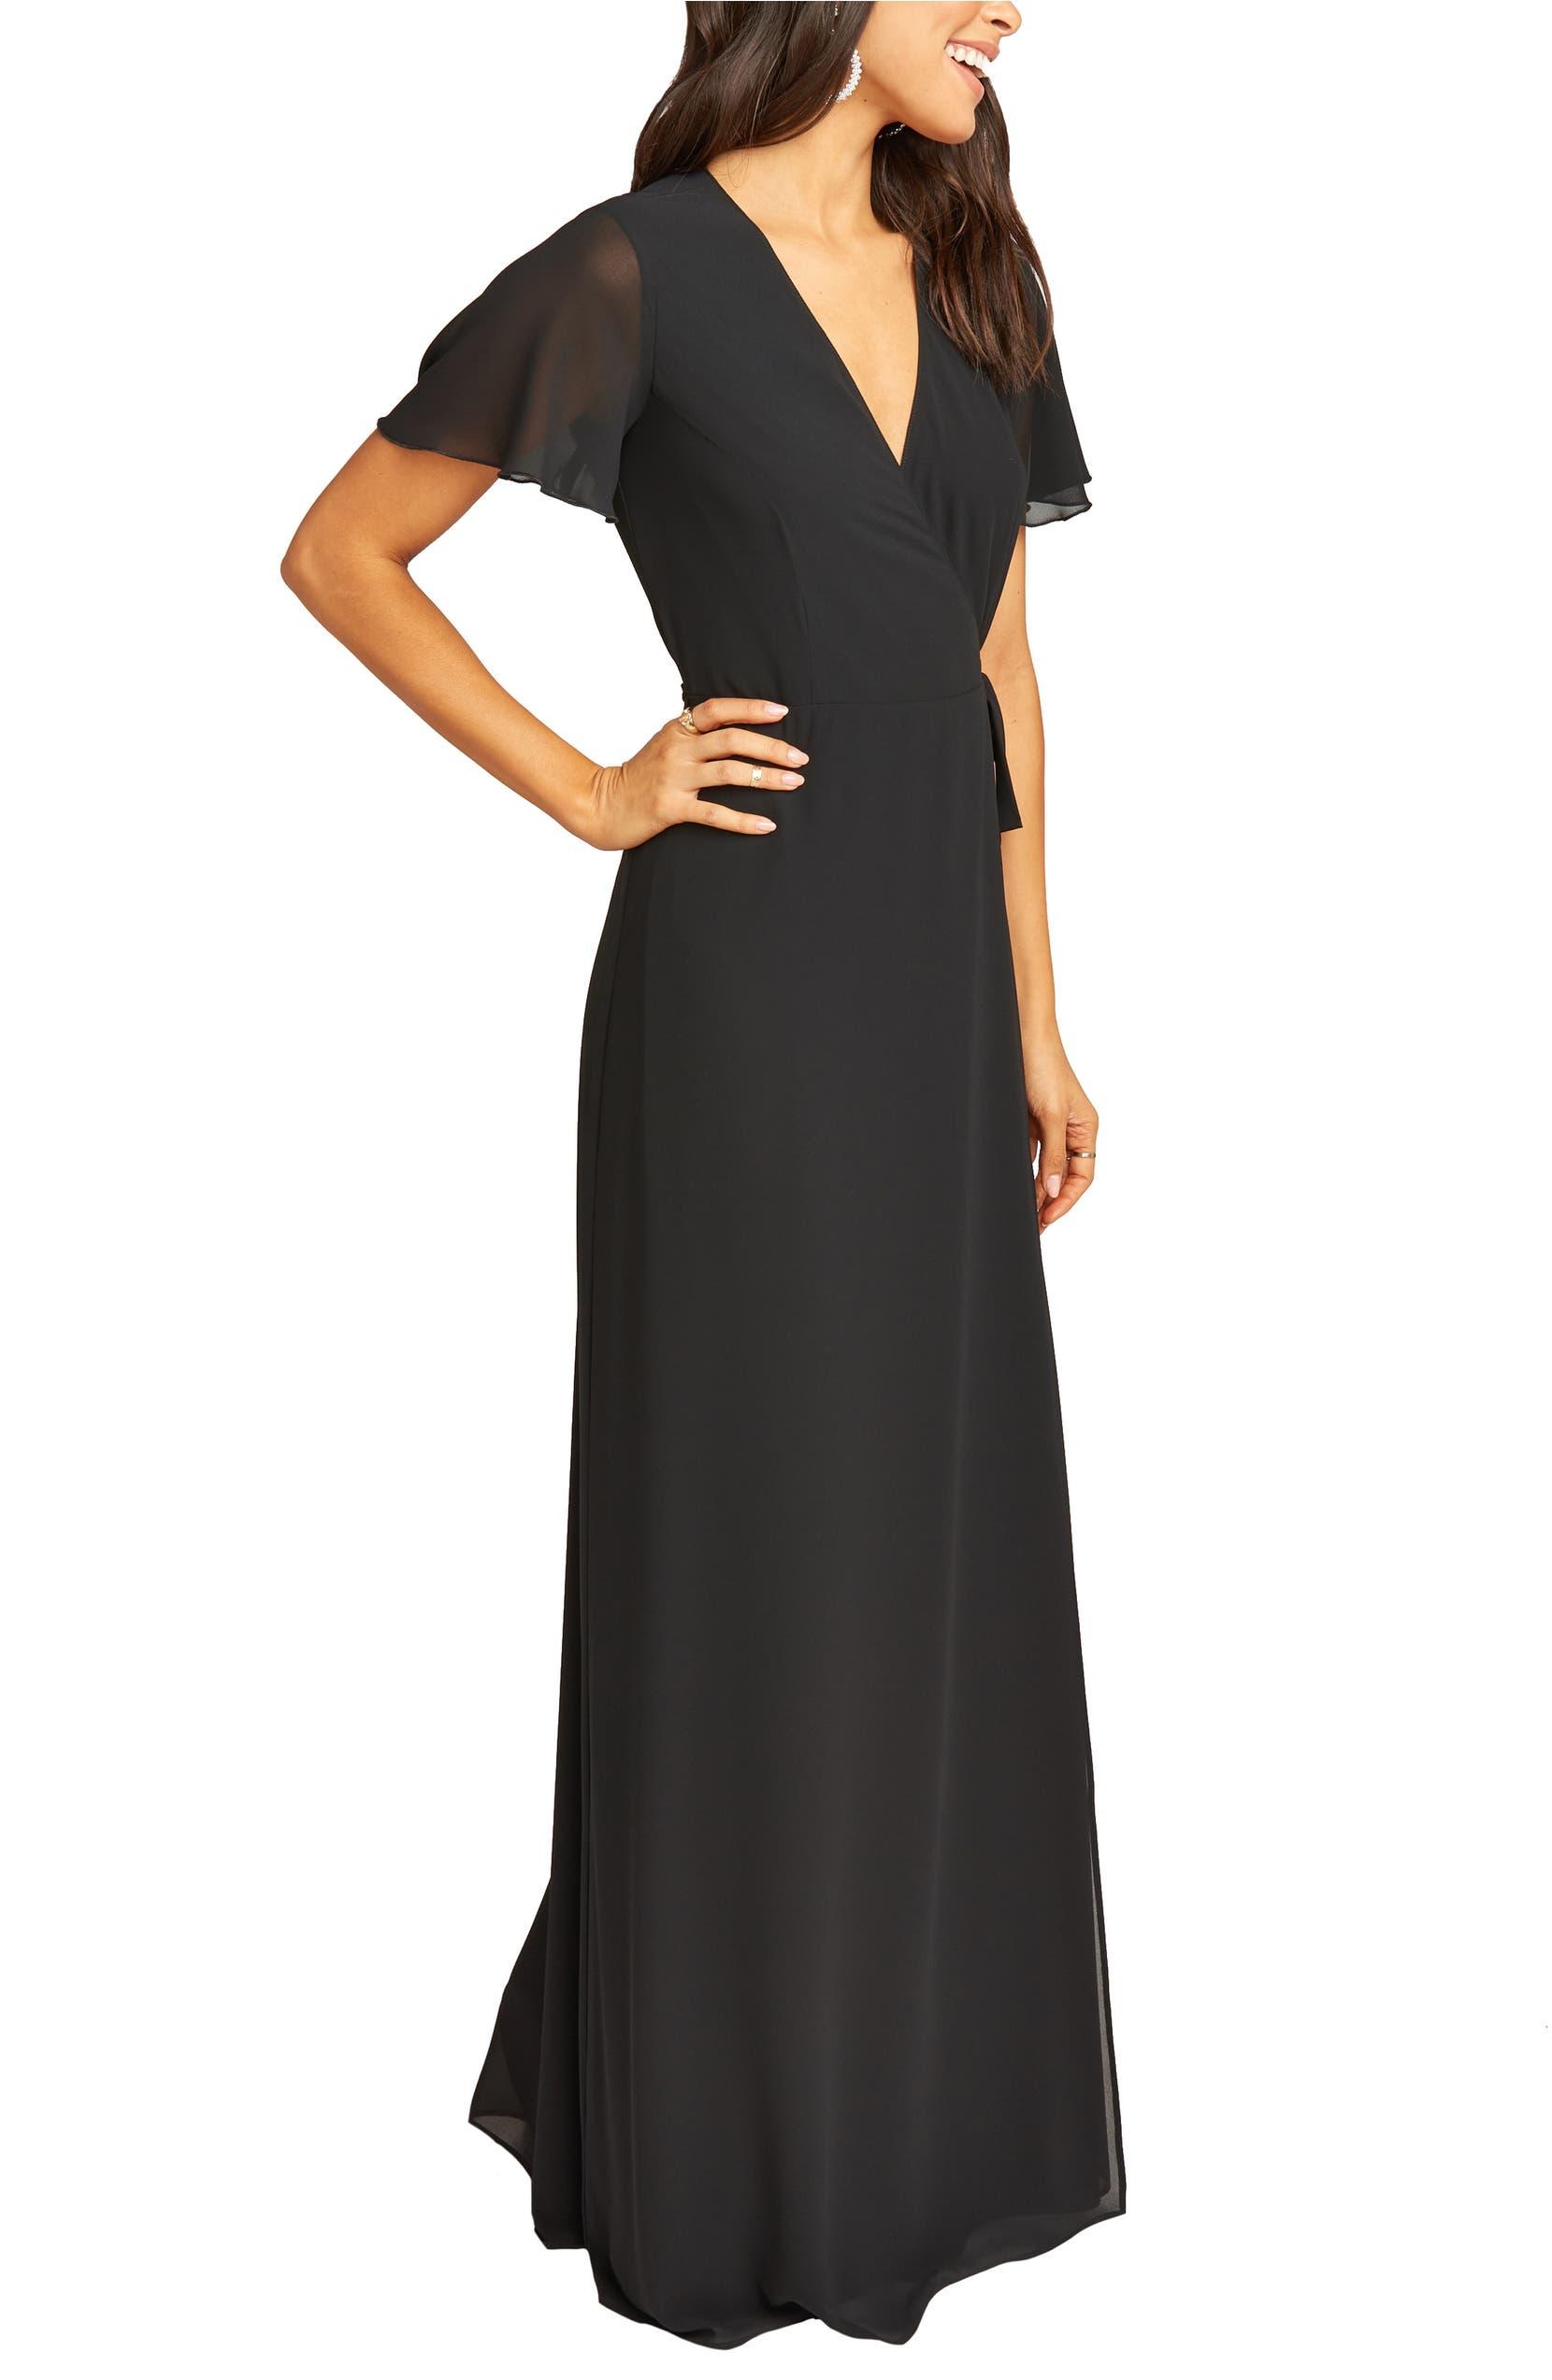 af014fc9b2a59 Noelle Wrap Dress